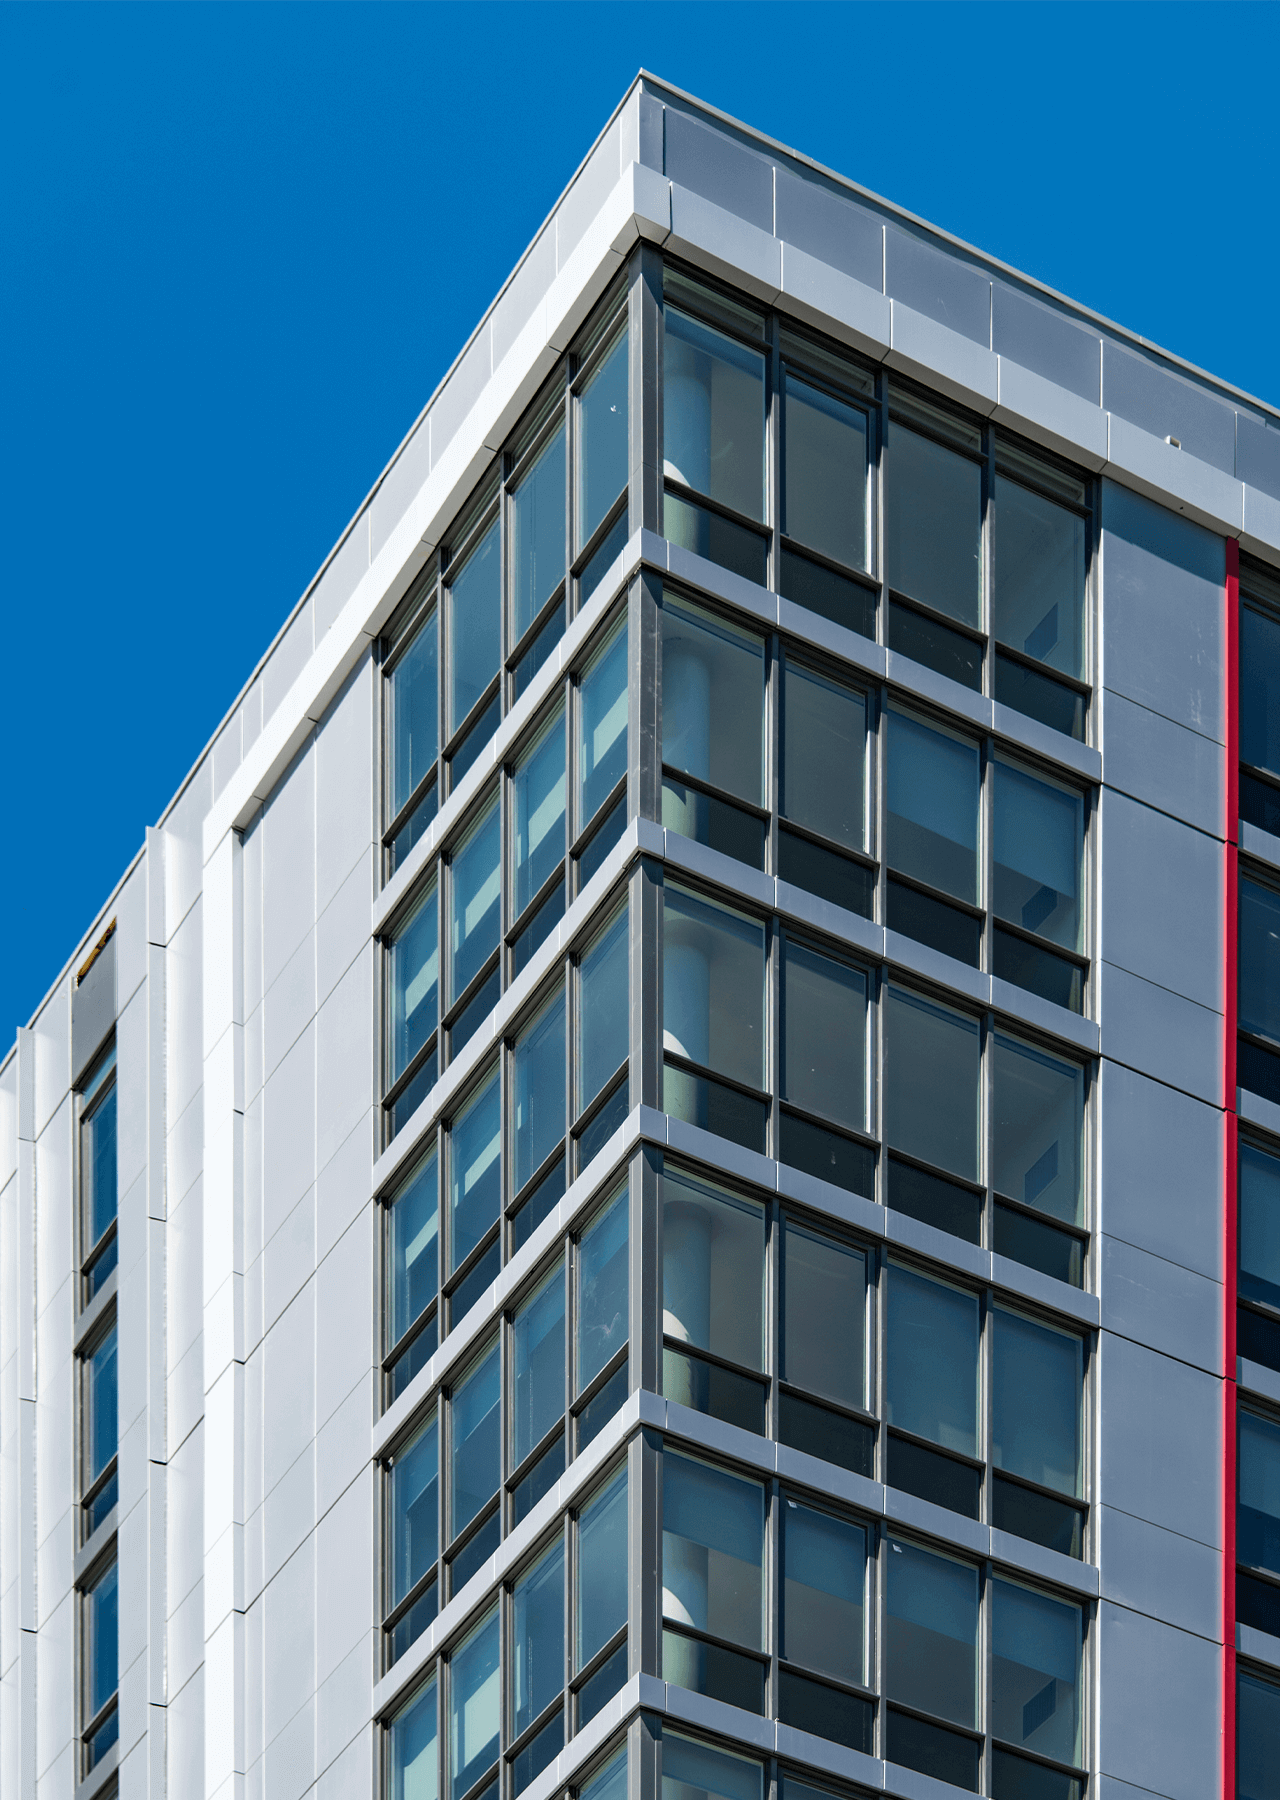 Continuum White Plains building